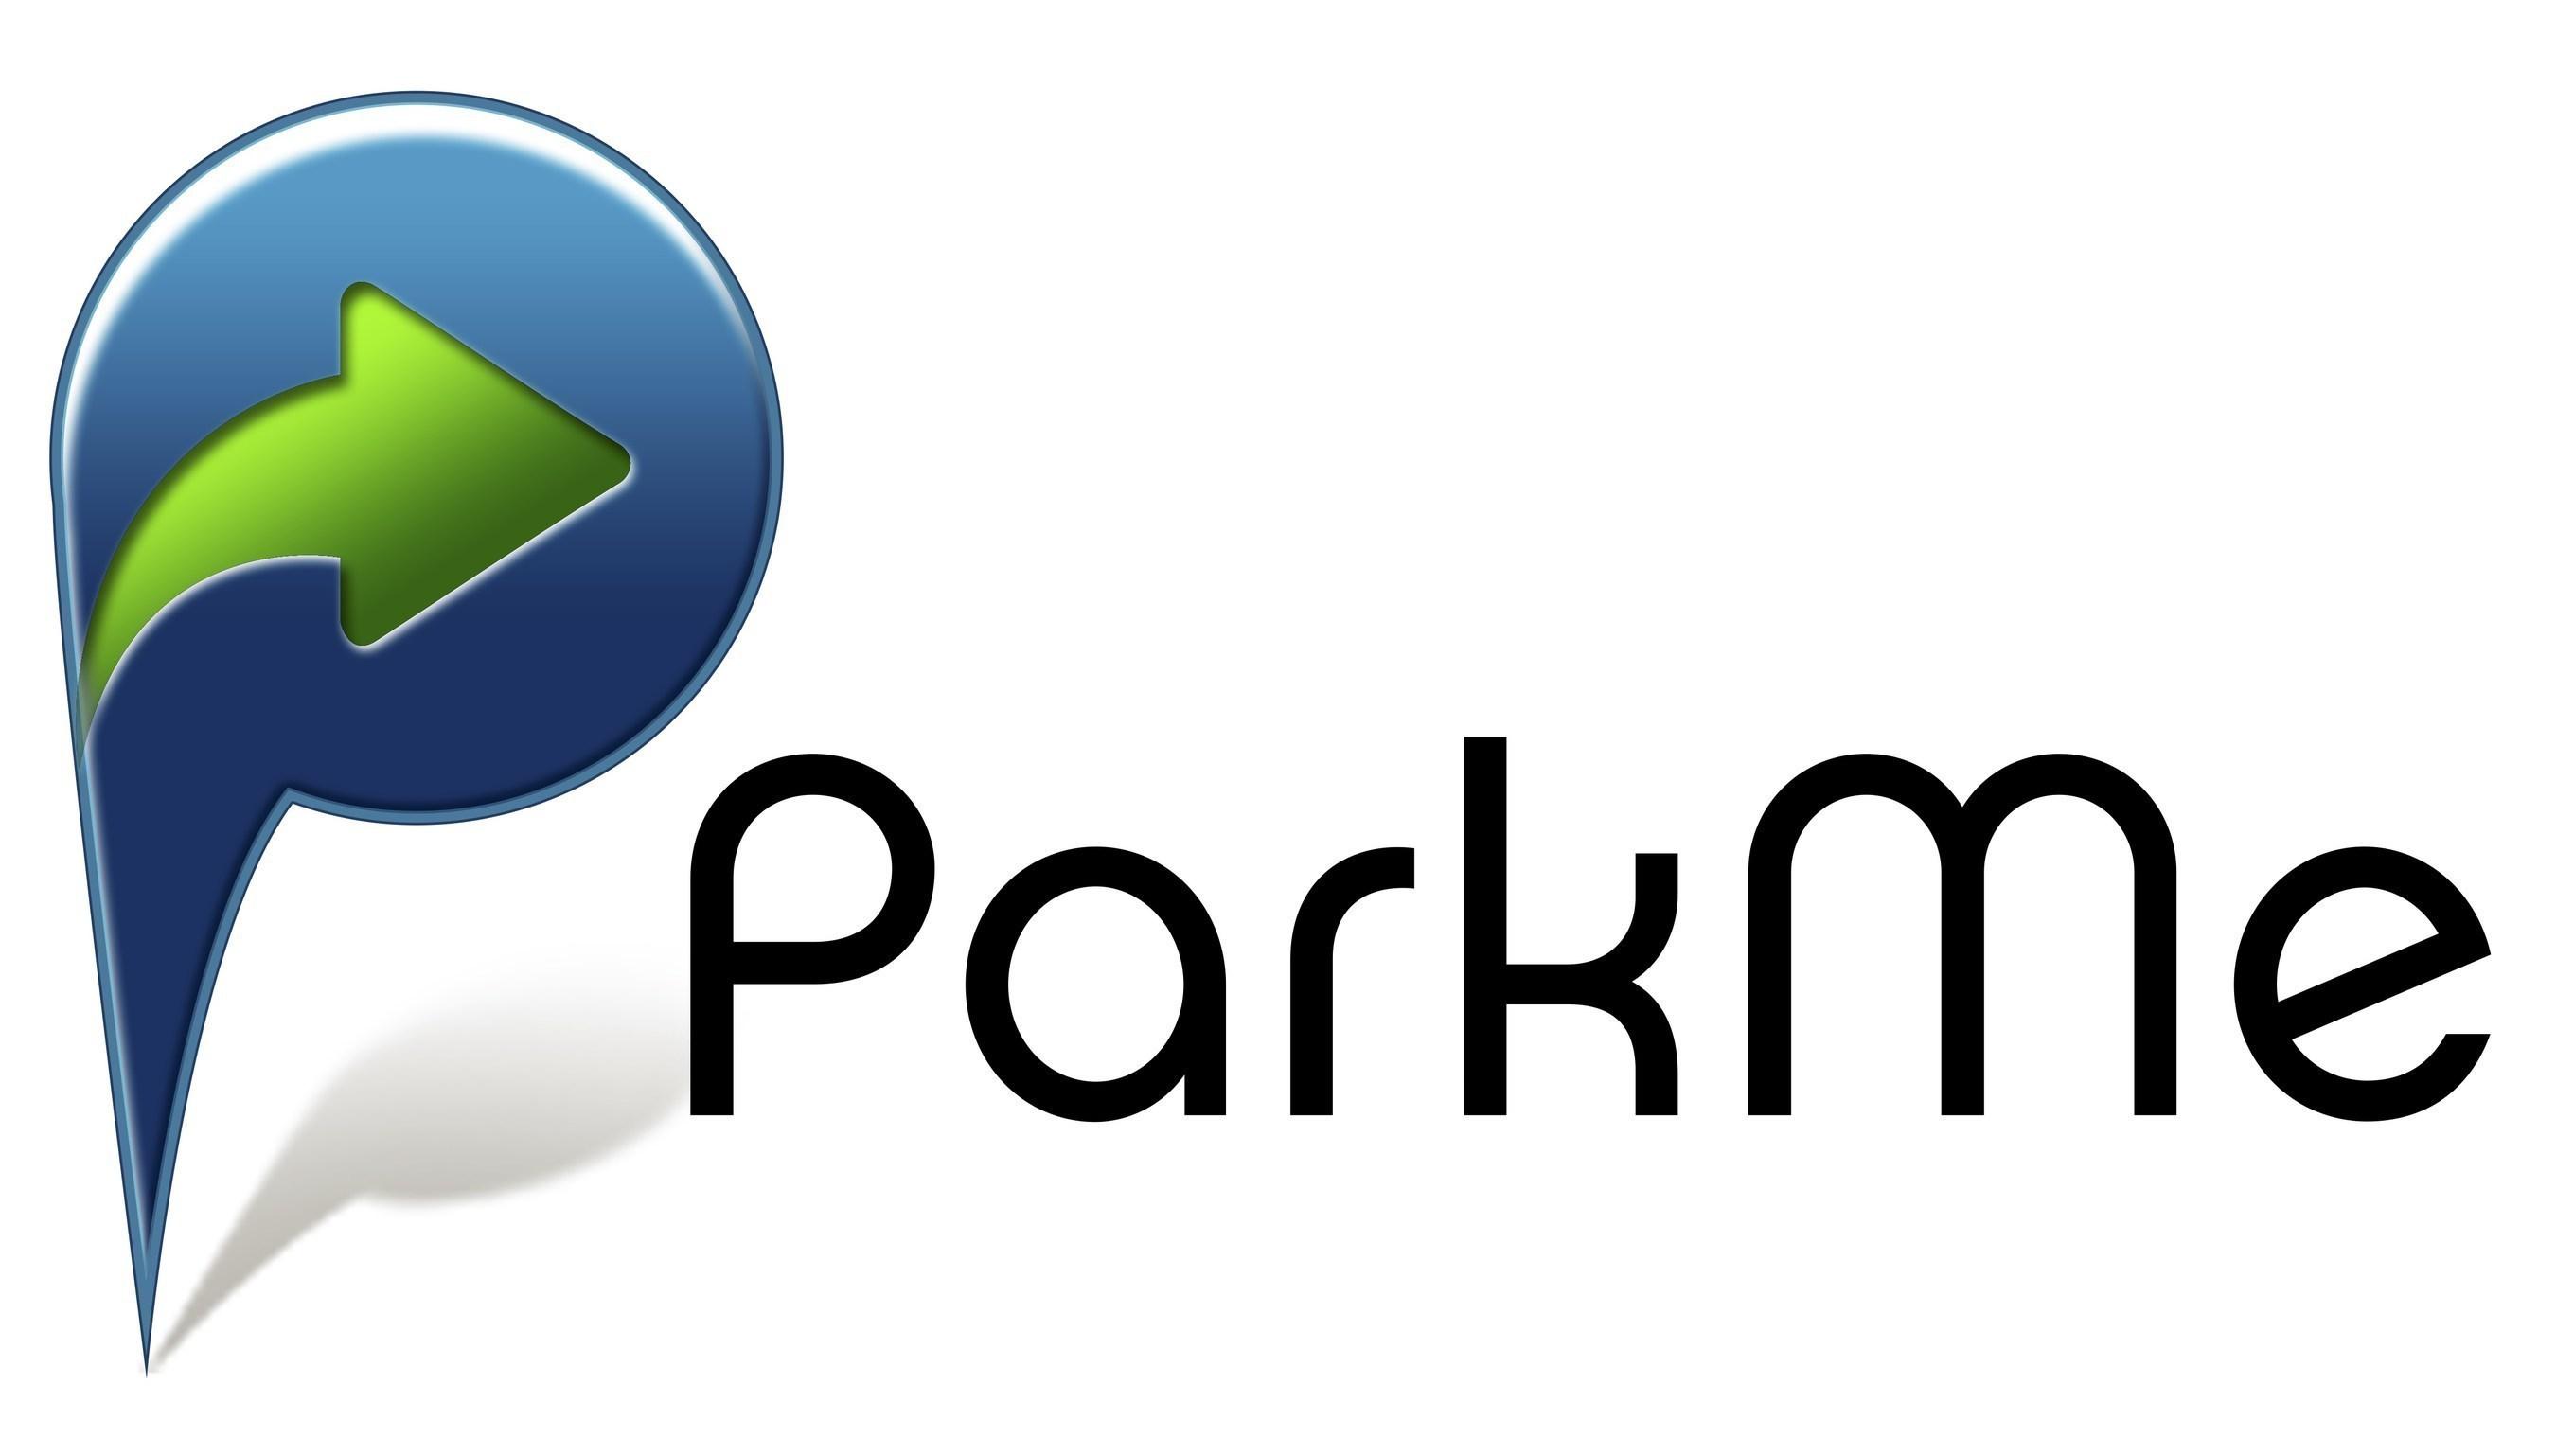 ParkMe logo.